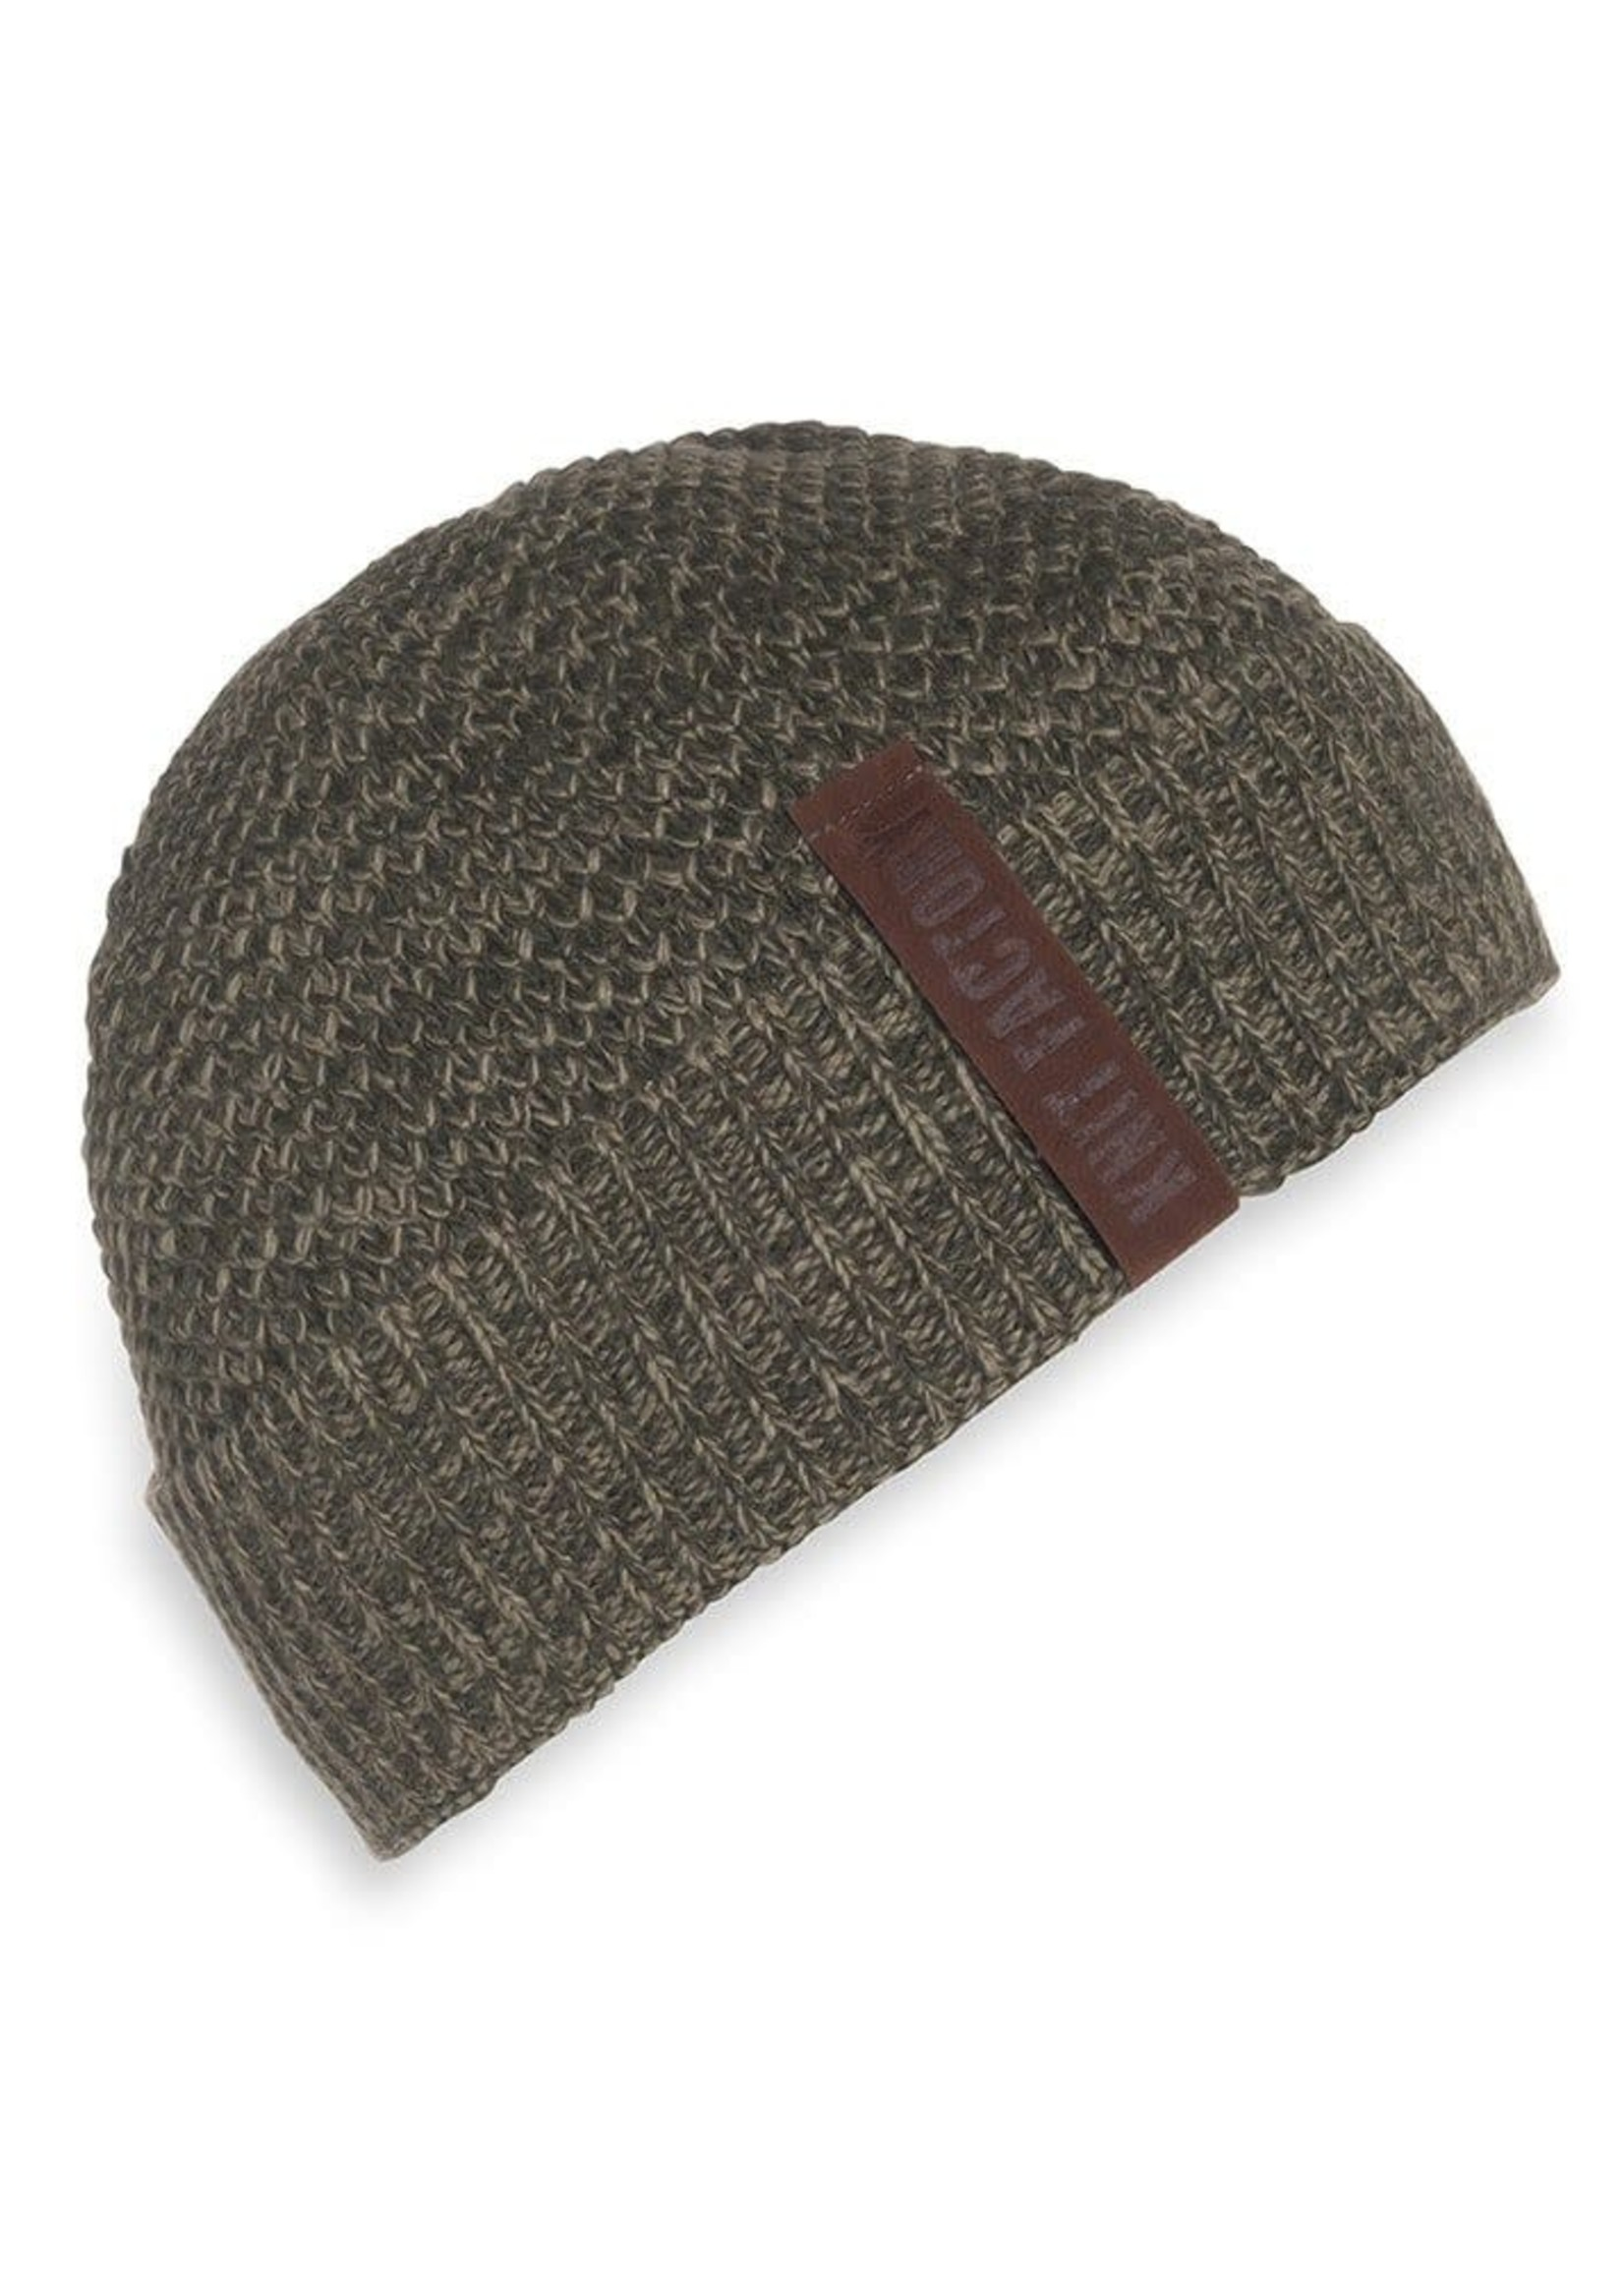 Knit Factory Knit Factory - Muts - Olijf groen